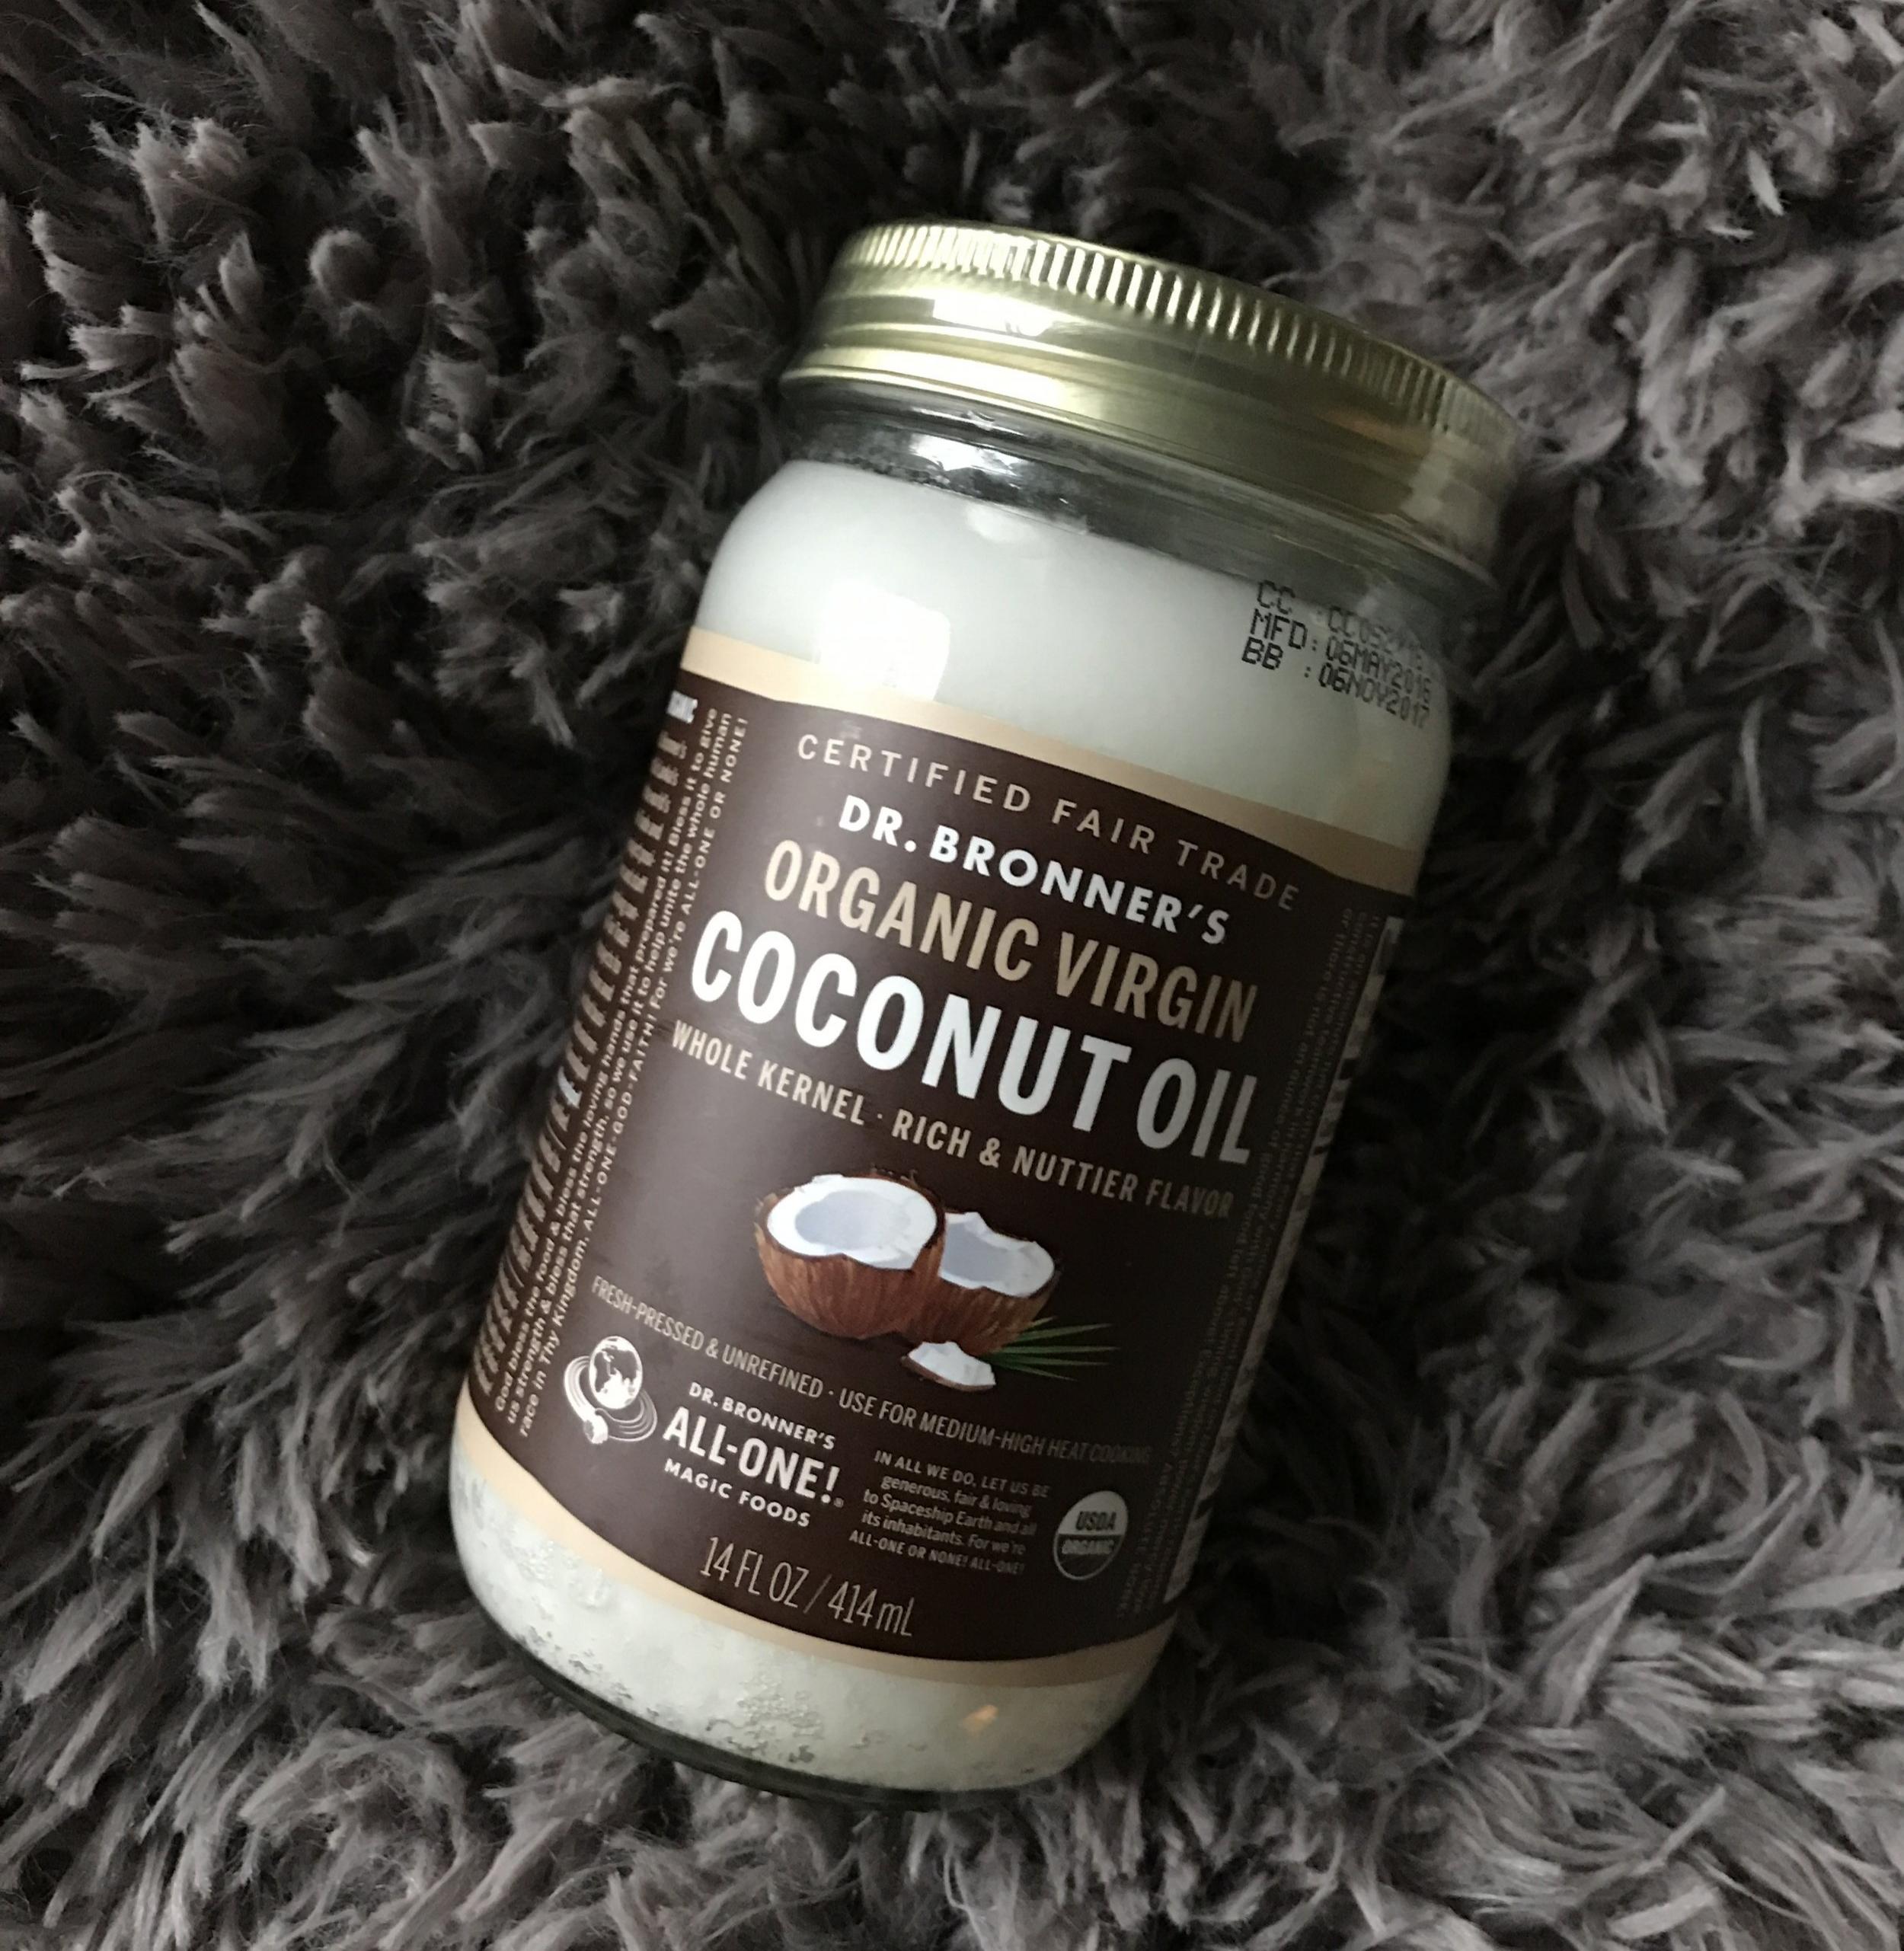 Organic Virgin Coconut Oil $6